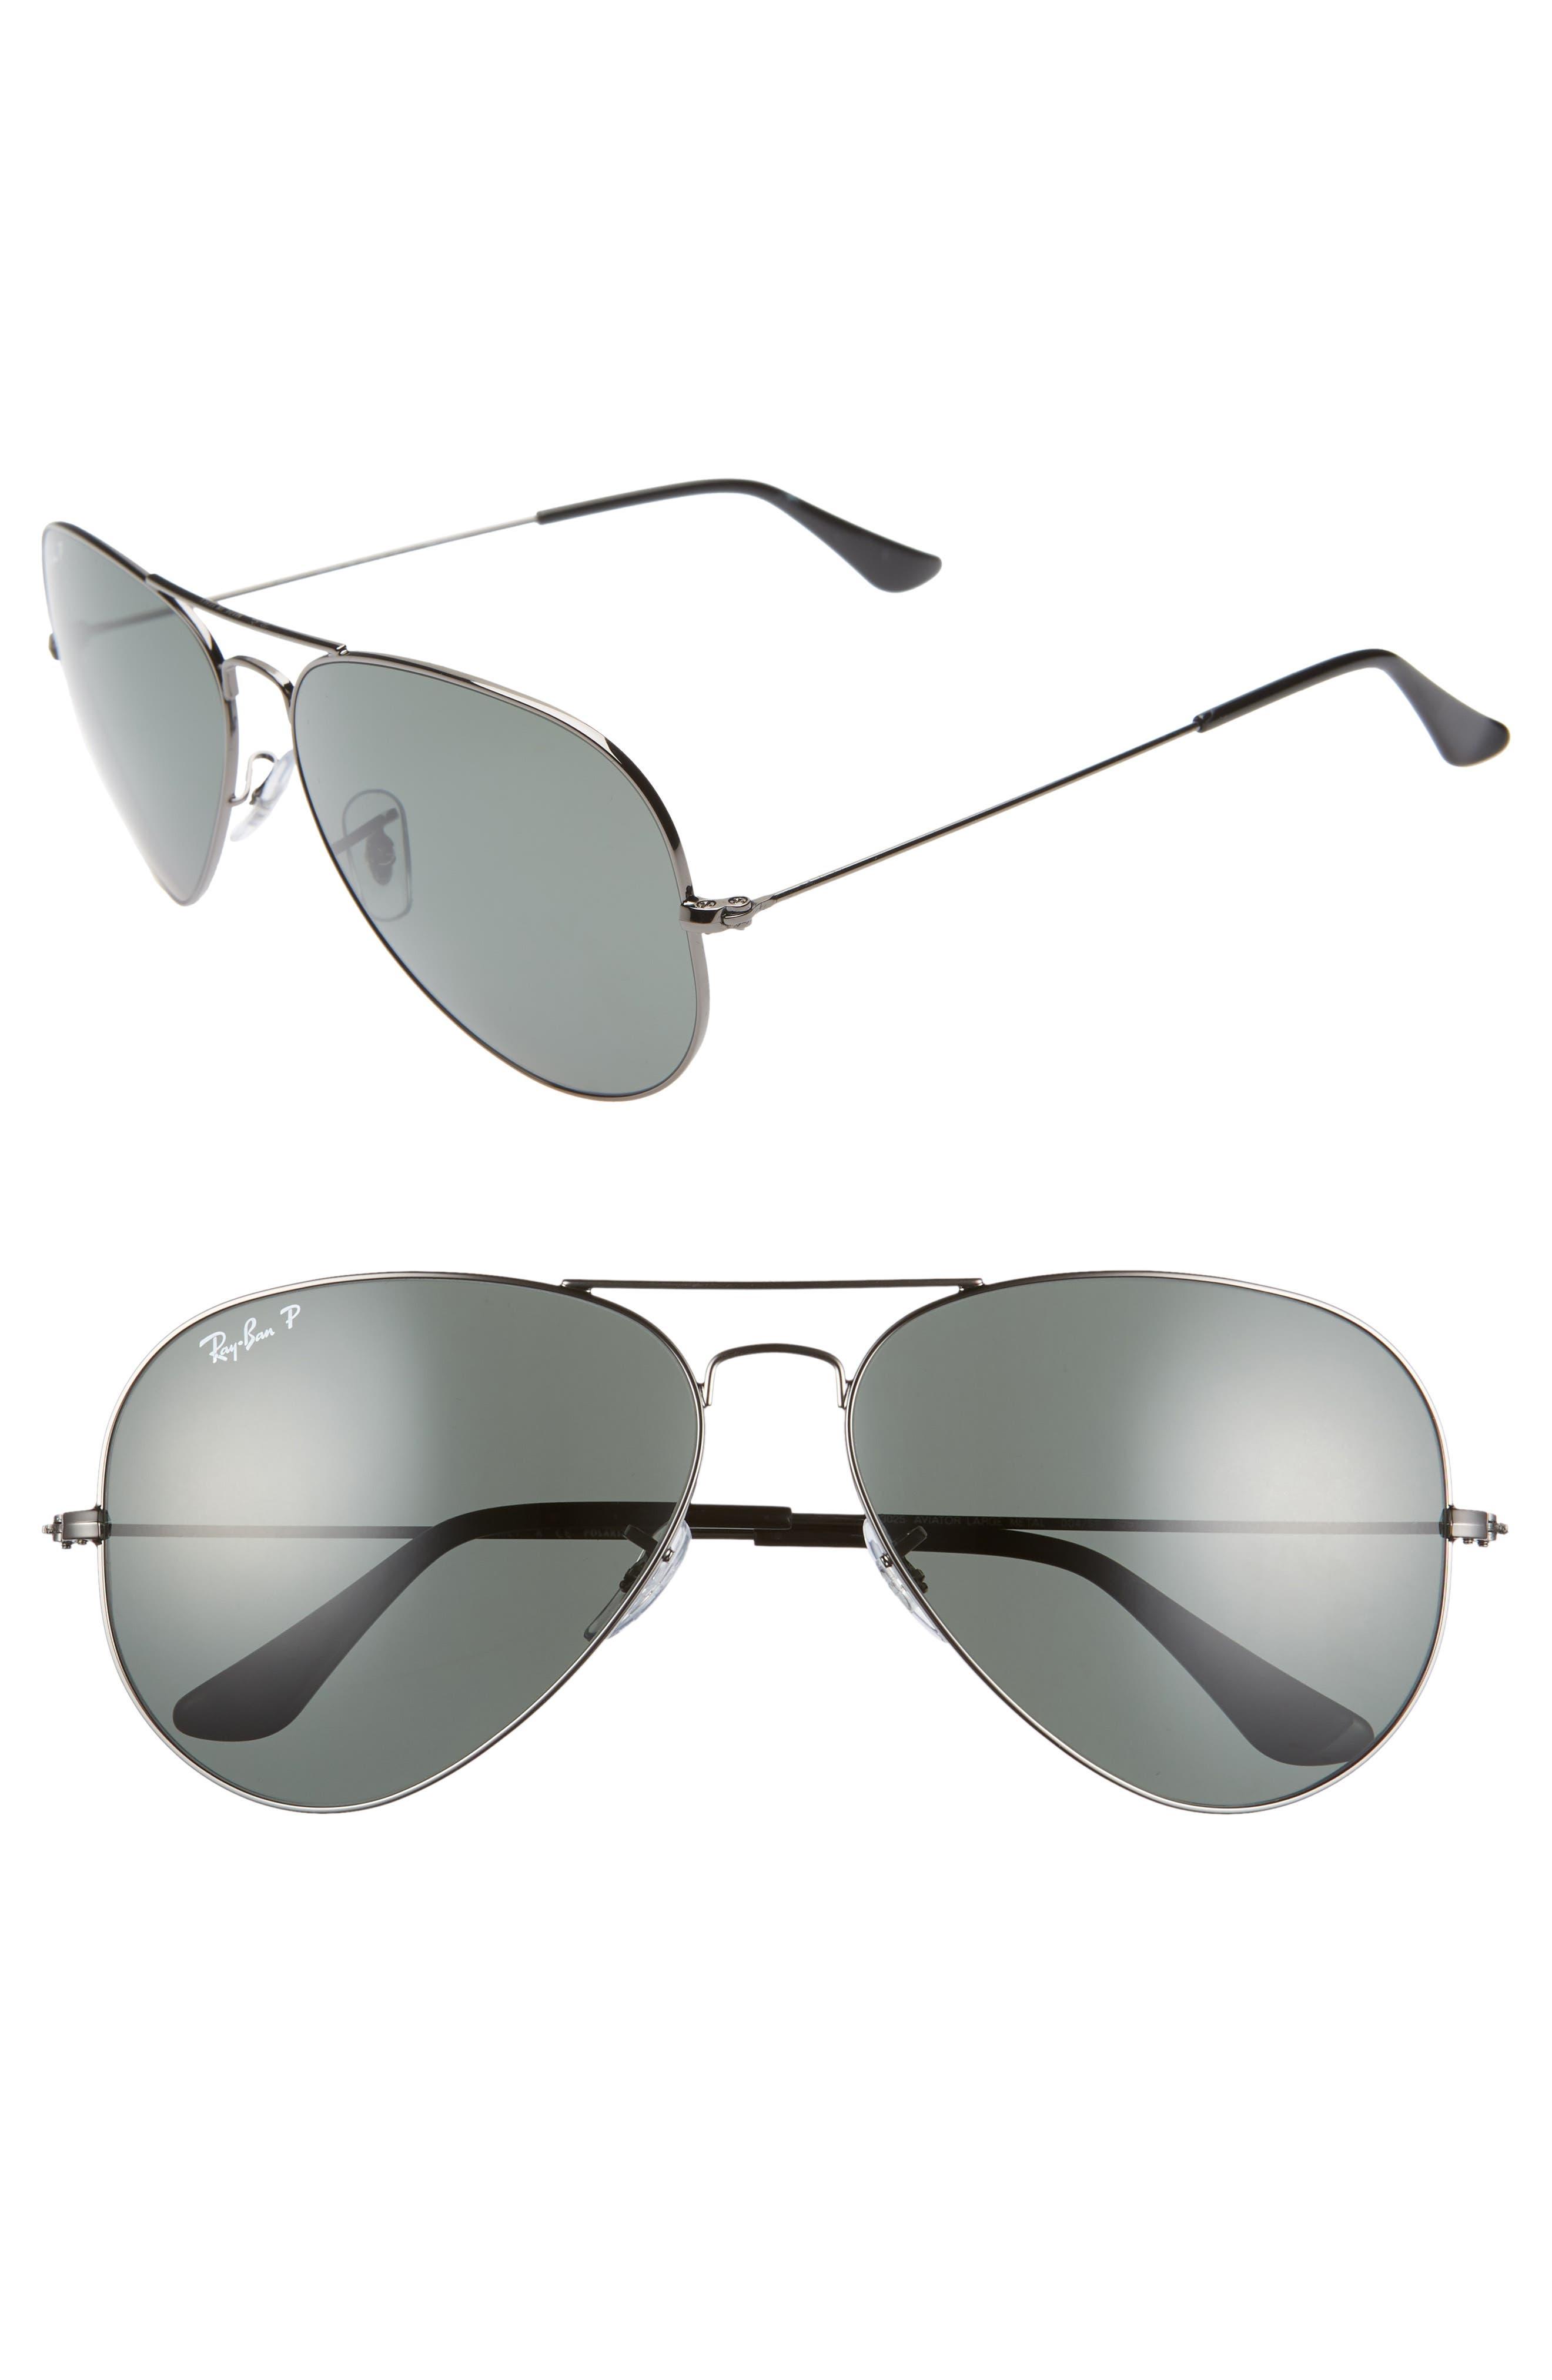 Ray-Ban Original 62Mm Oversize Polarized Aviator Sunglasses -